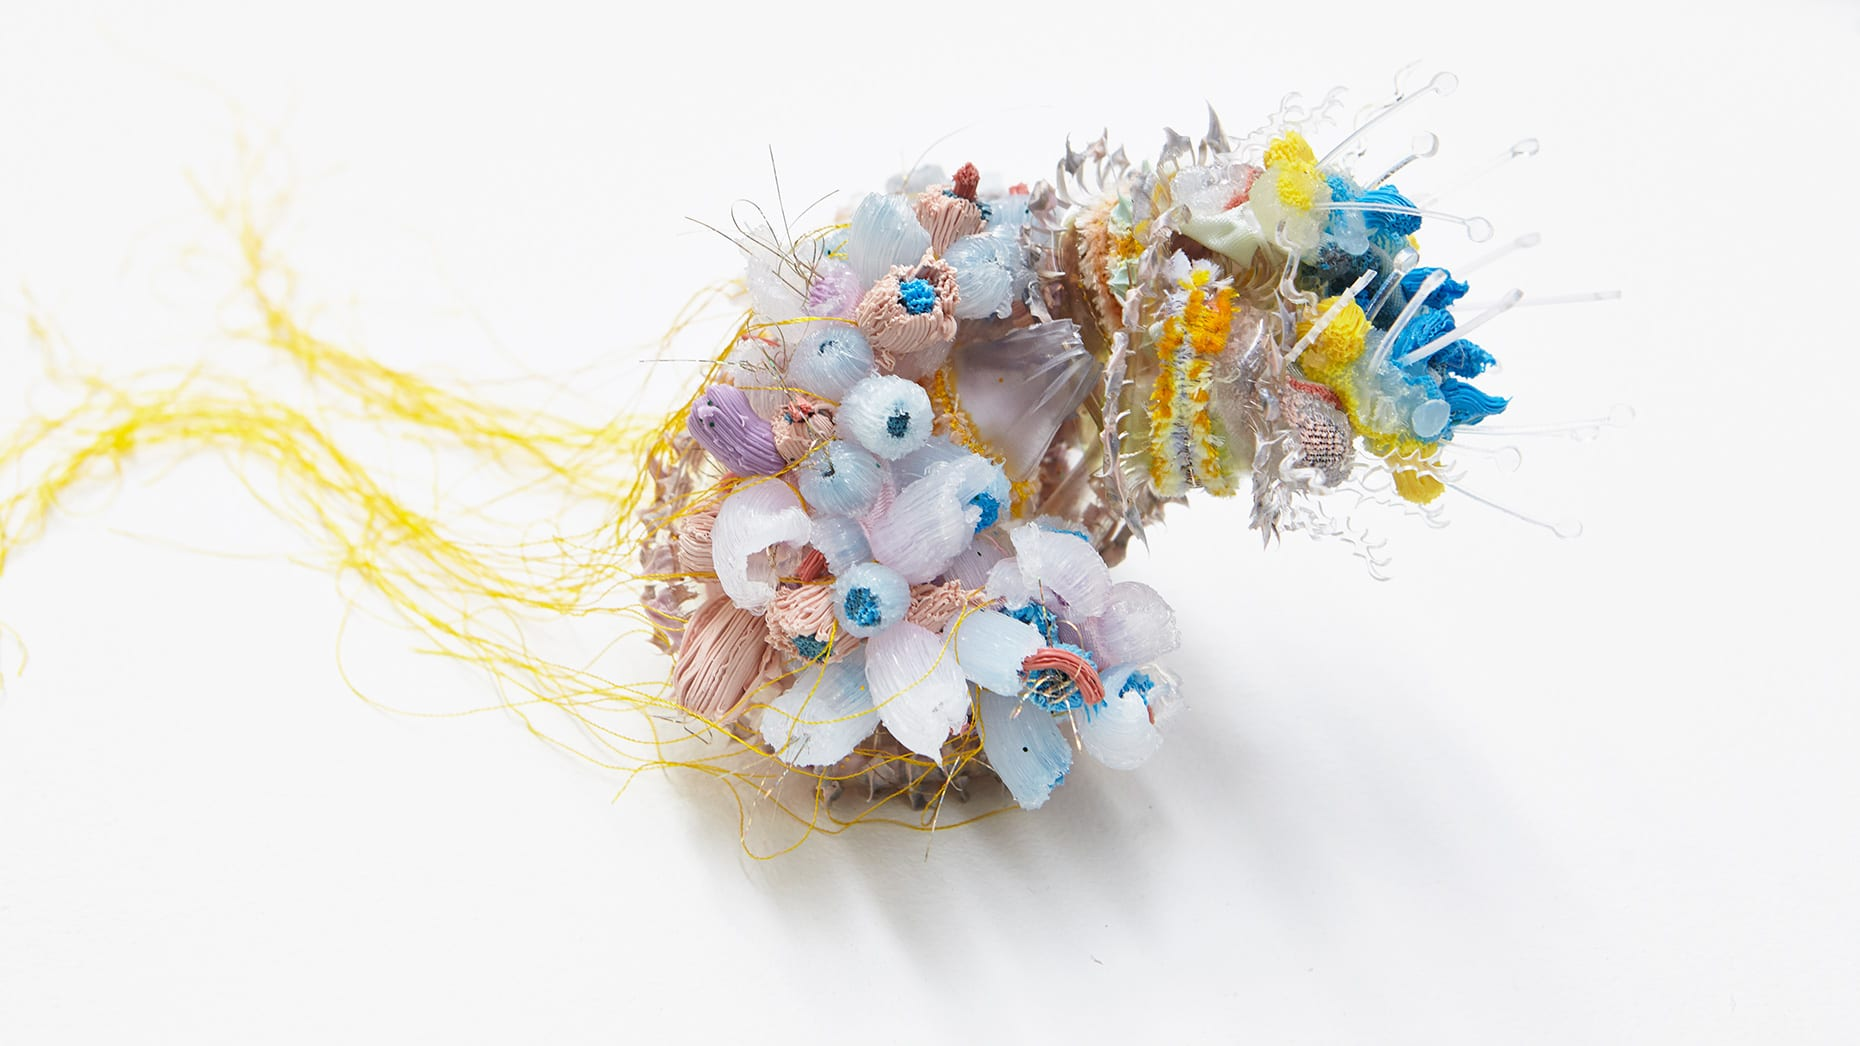 Chelsea-2015-BA-Textile-Design-Jing-Tan-2-1860.jpg